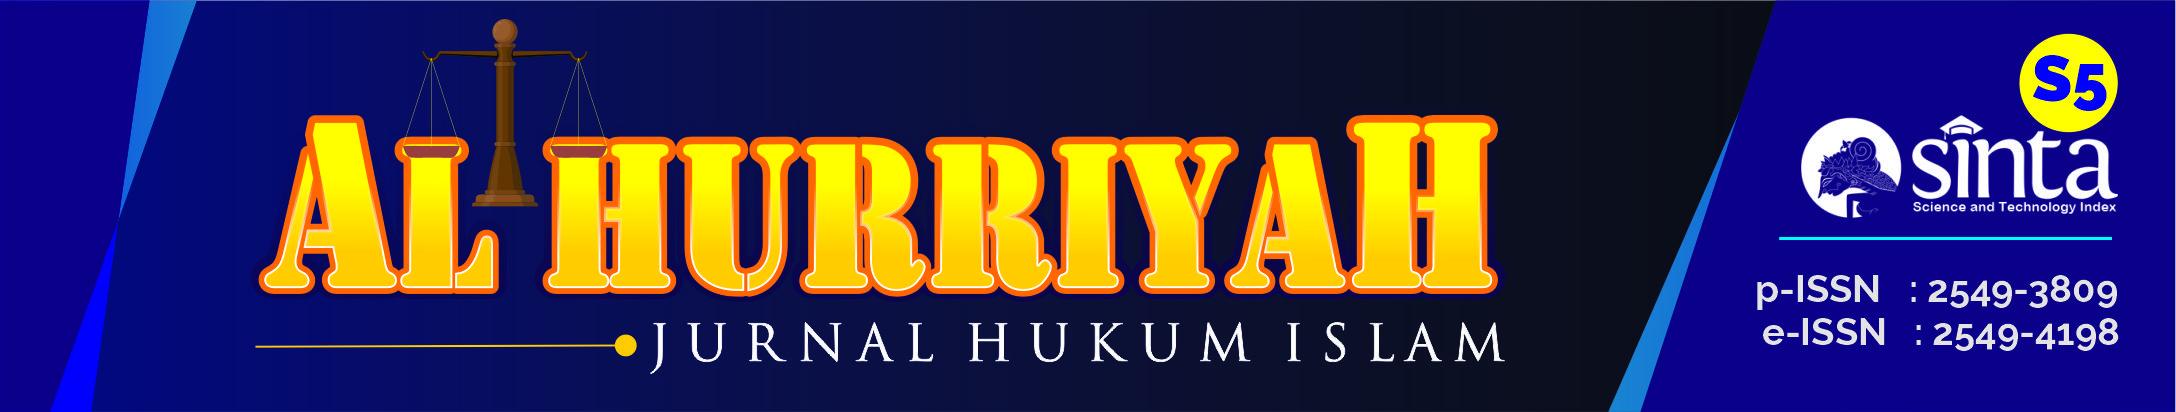 Al-Hurriyah - Jurnal Hukum Islam